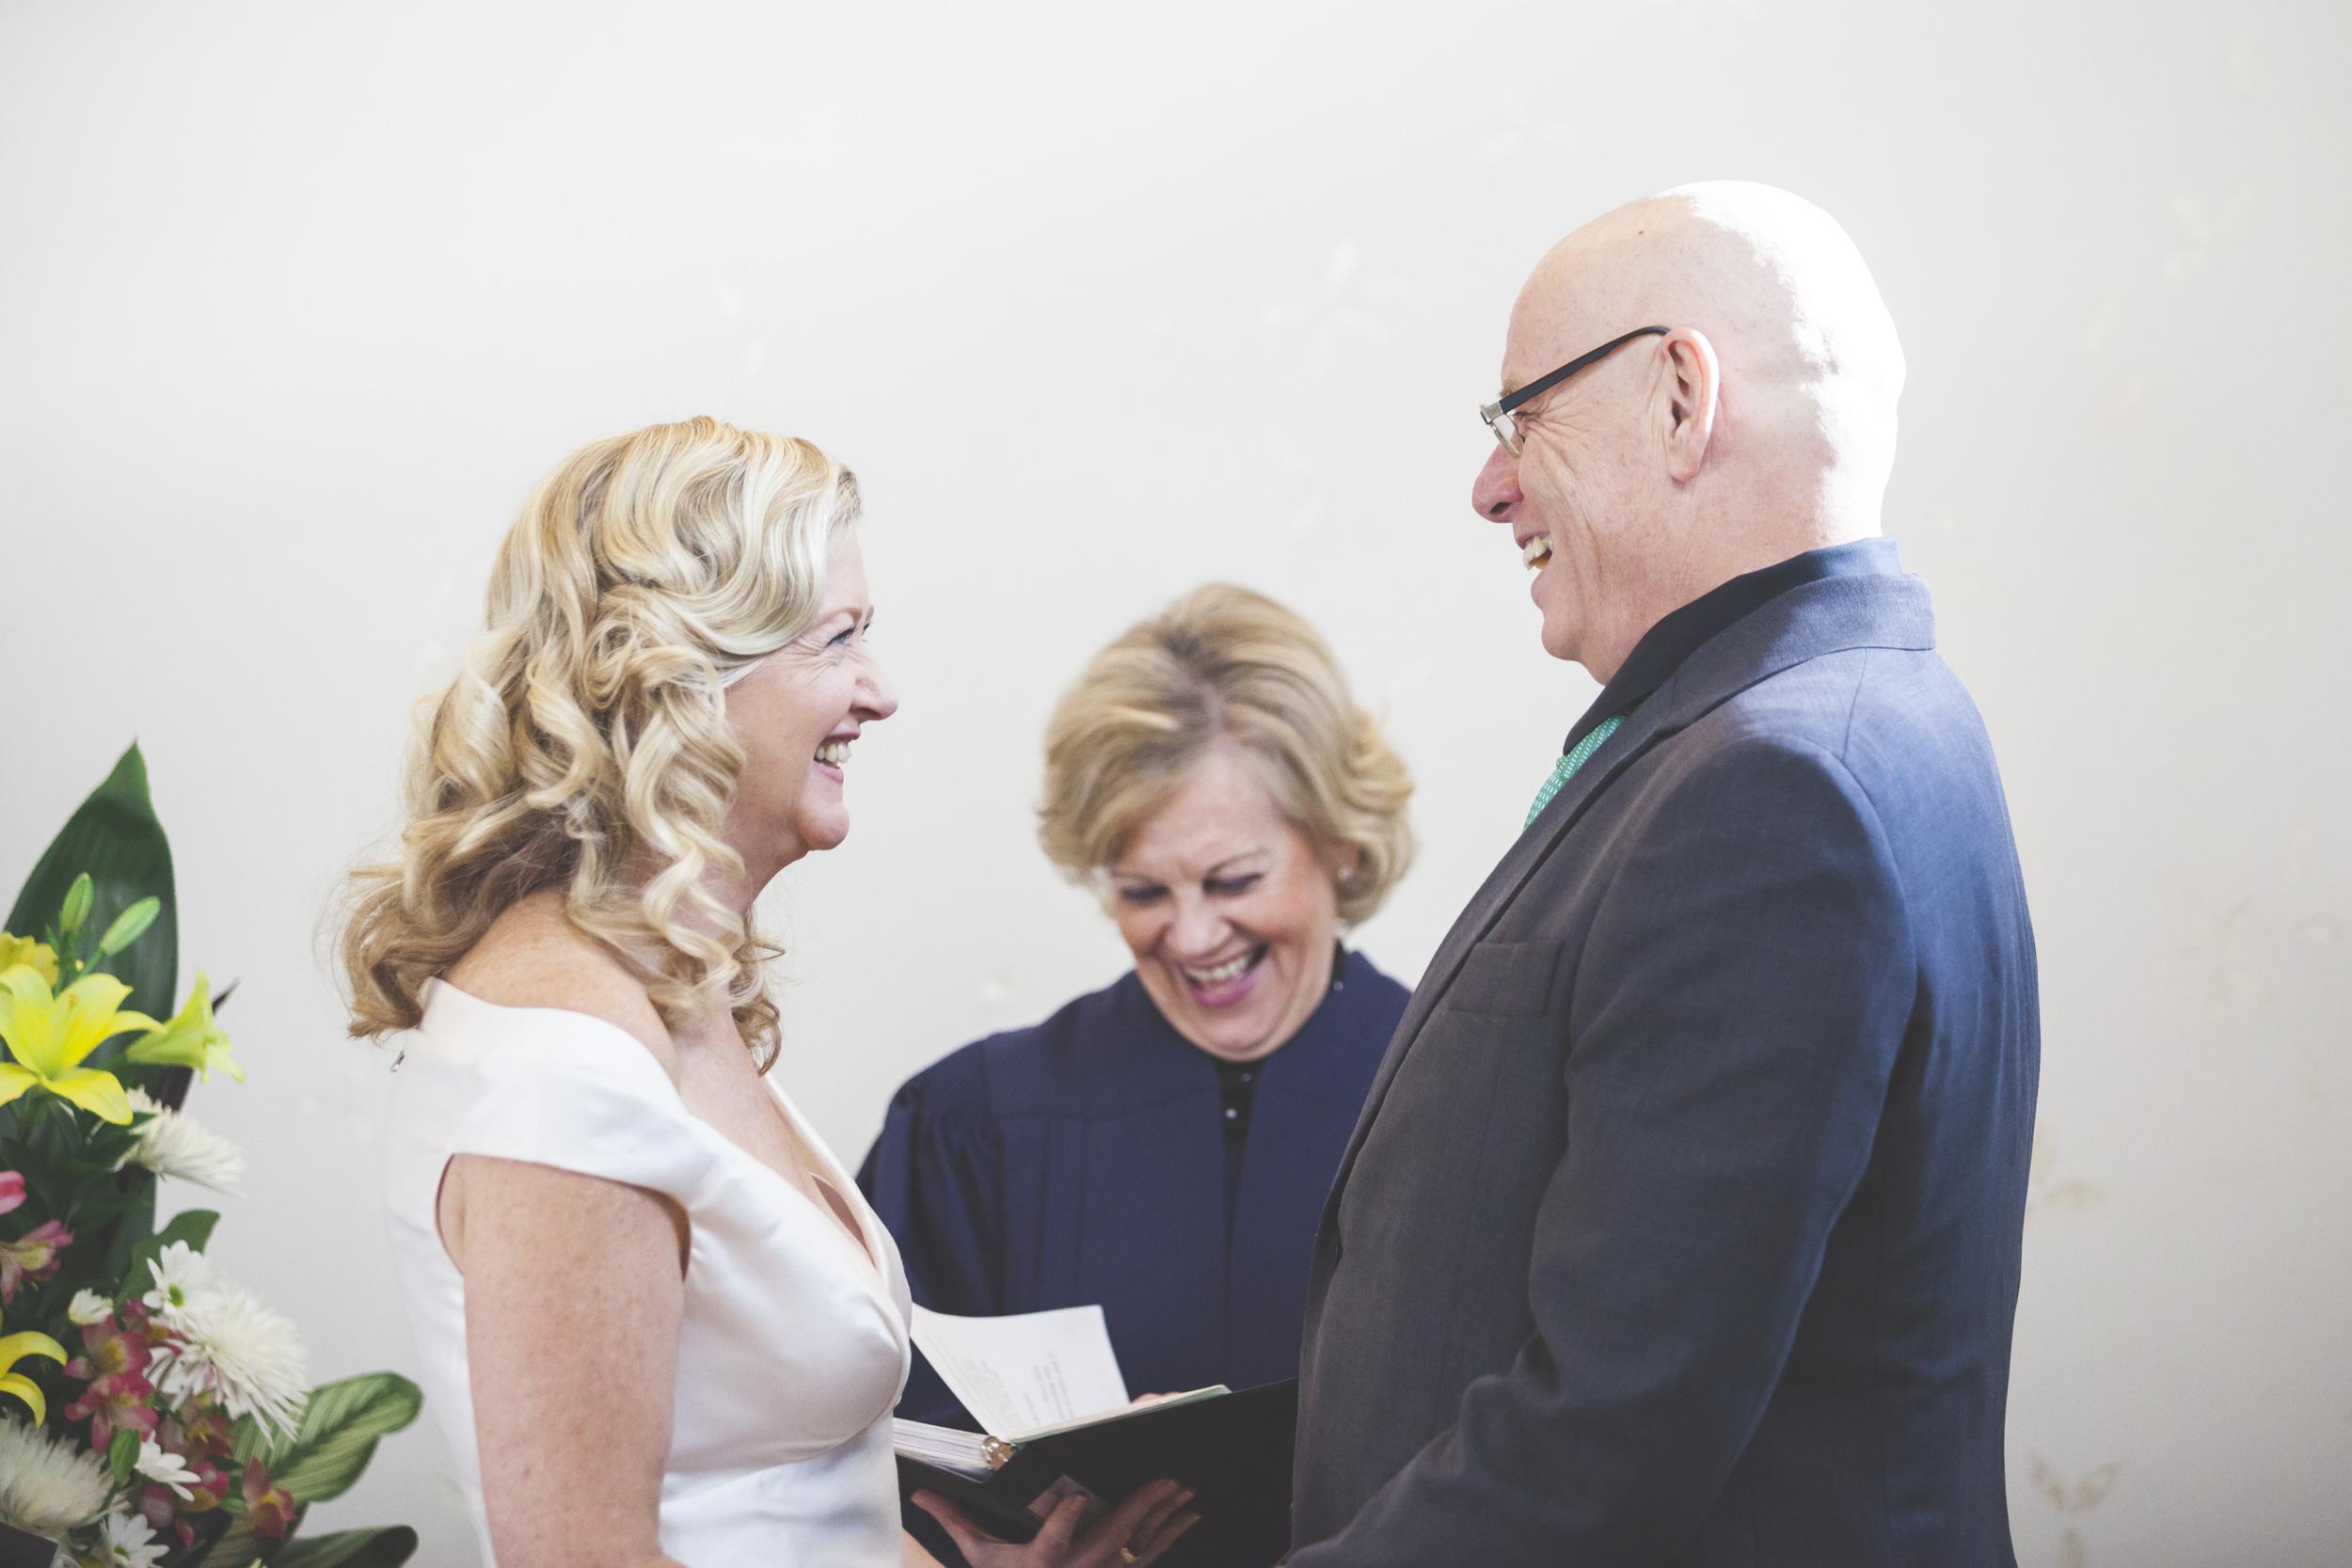 Wedding ceremony at Toronto City Hall